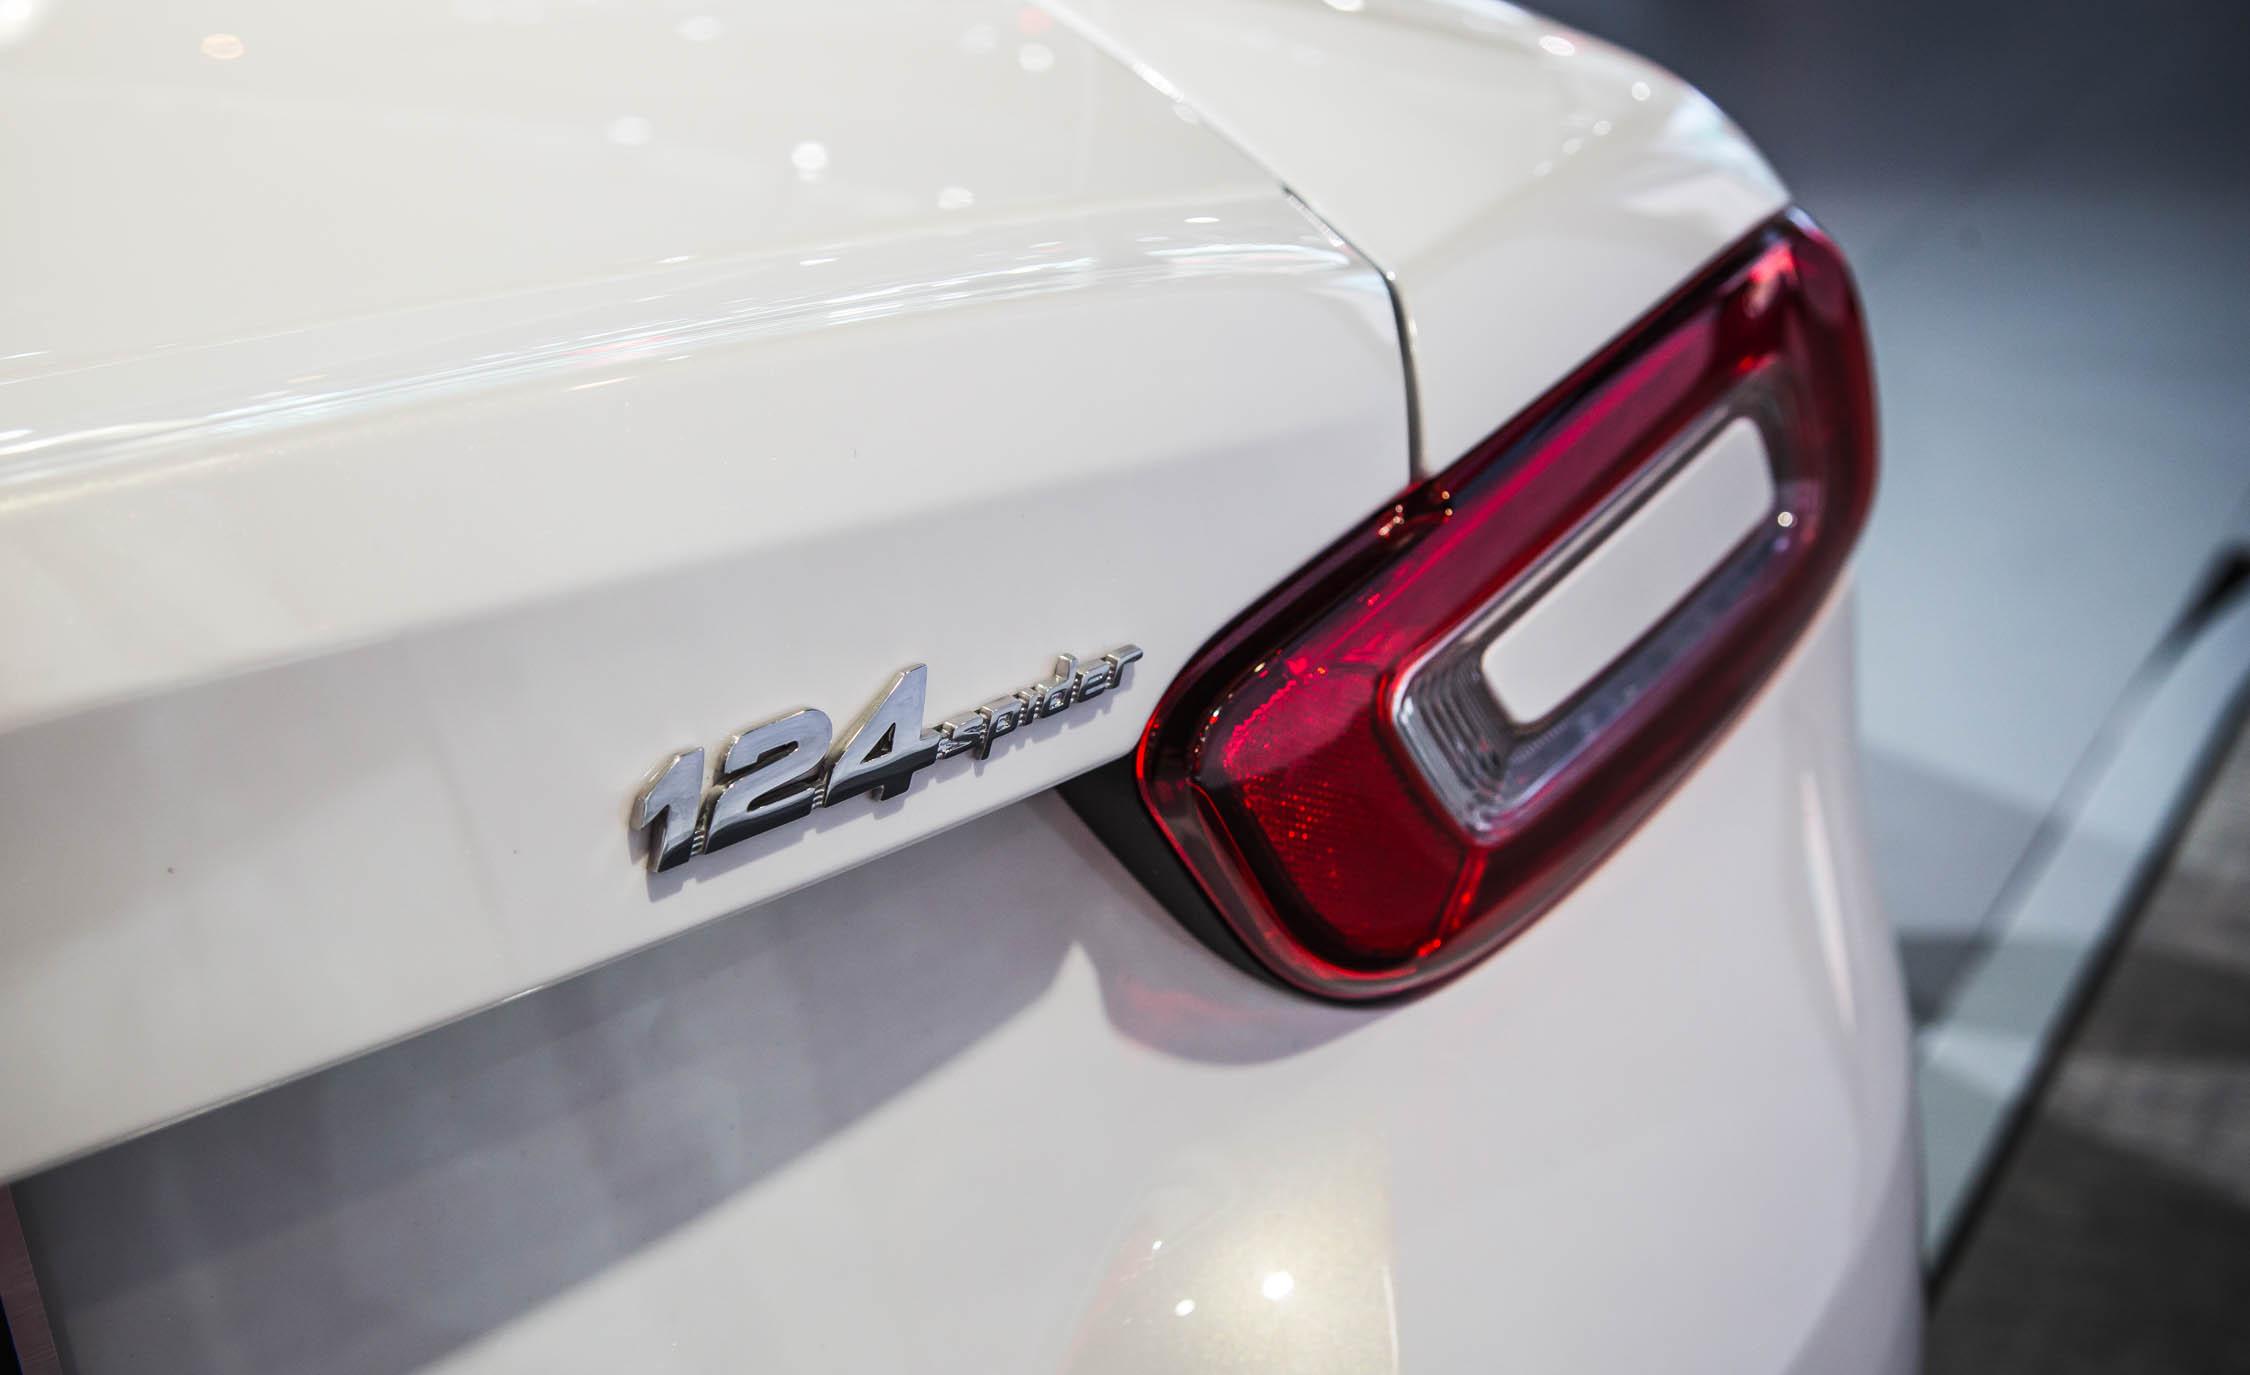 2017 Fiat 124 Spider Rear Emblem